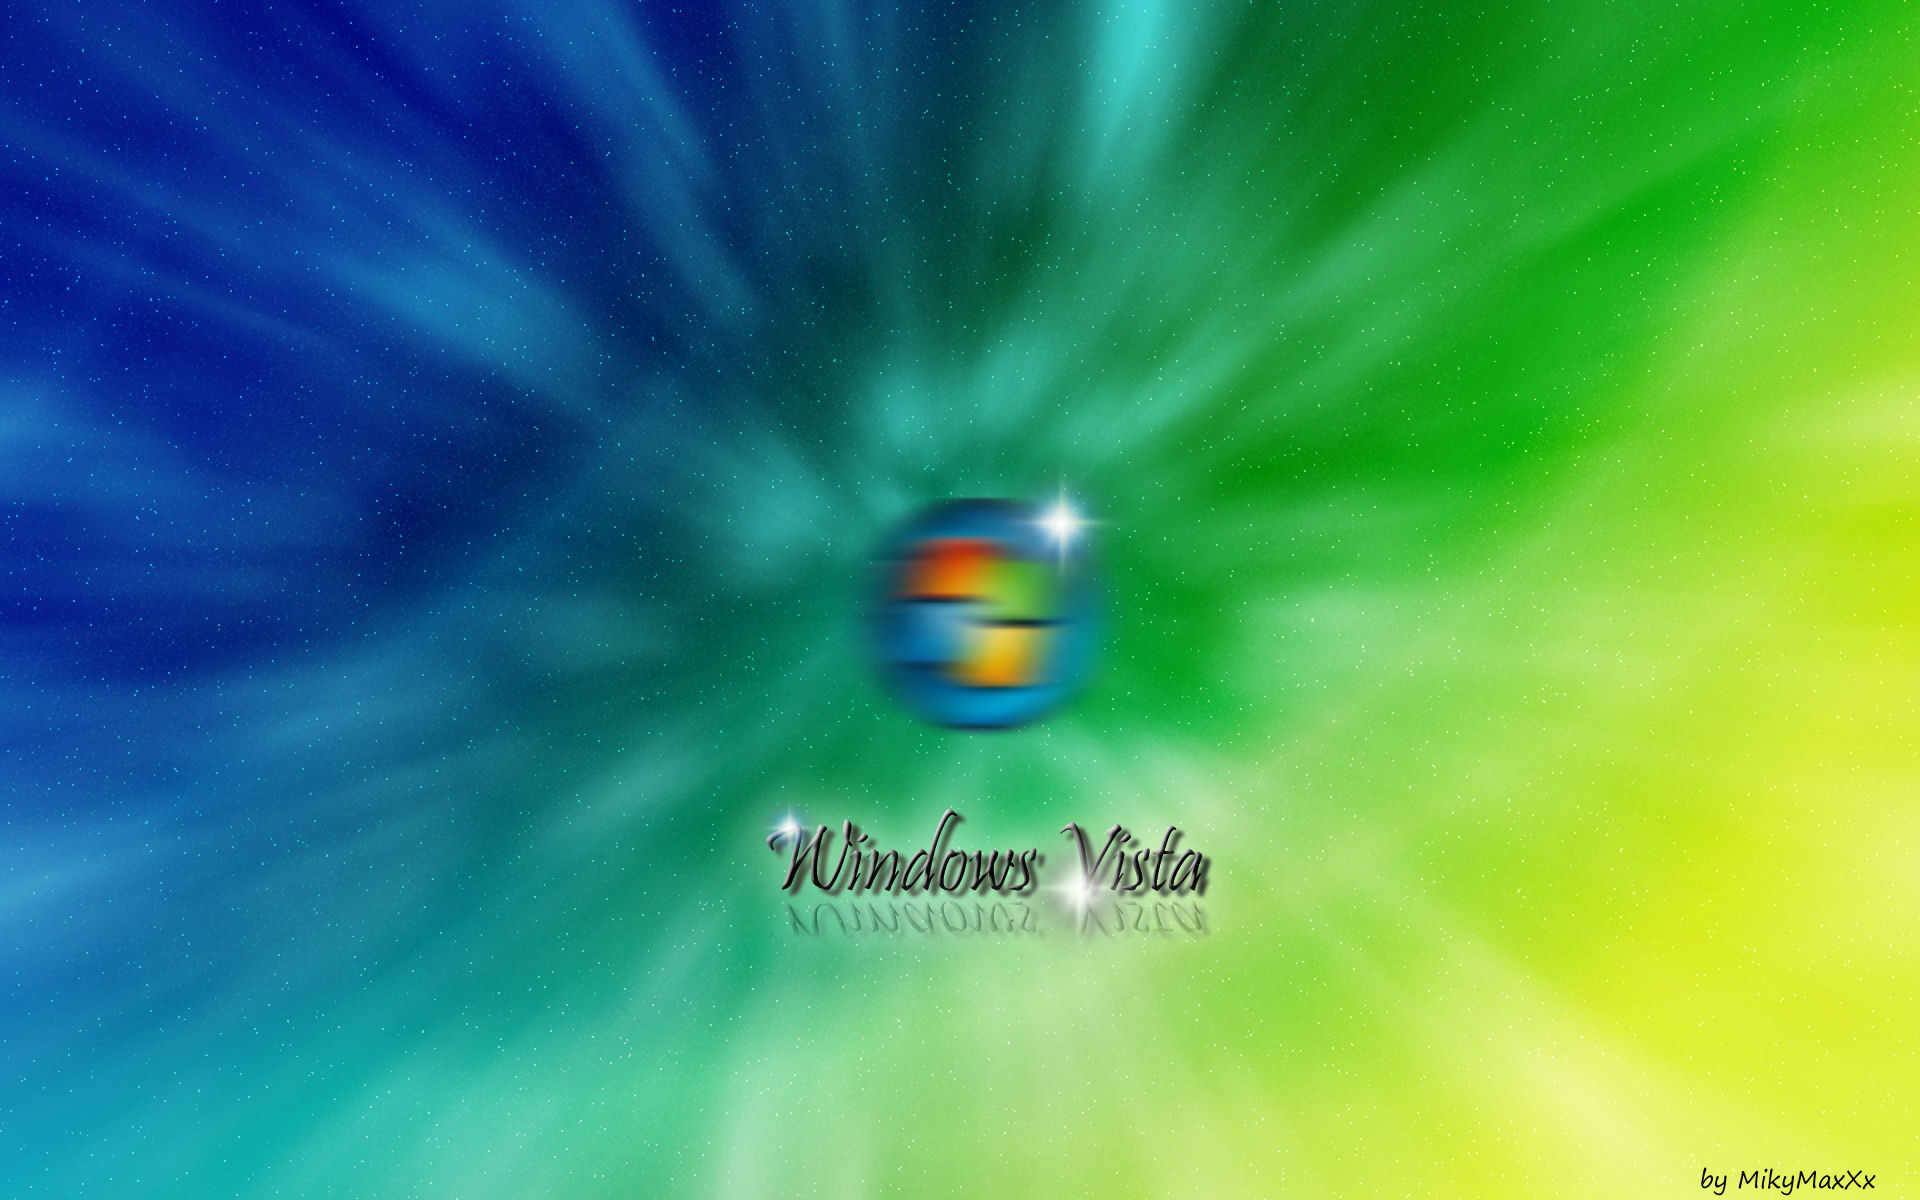 Fond d 39 ecran vista mikymaxxx wallpaper for Fond ecran vista